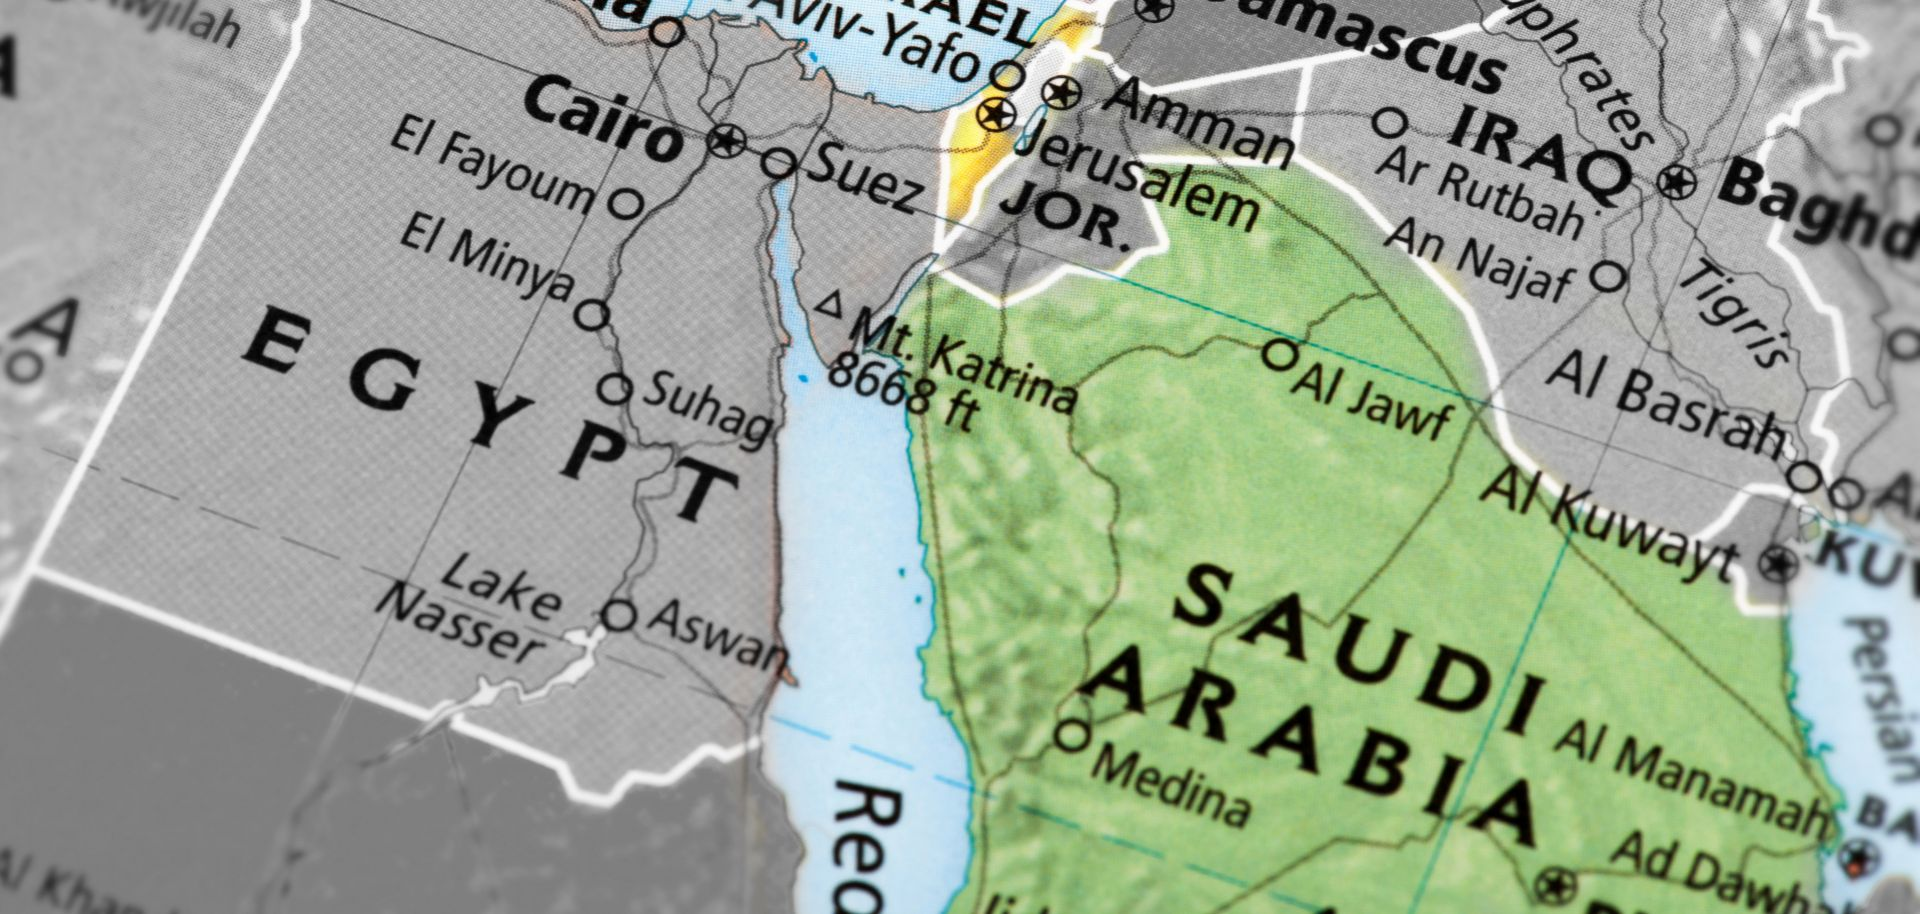 A map of Saudi Arabia and Israel